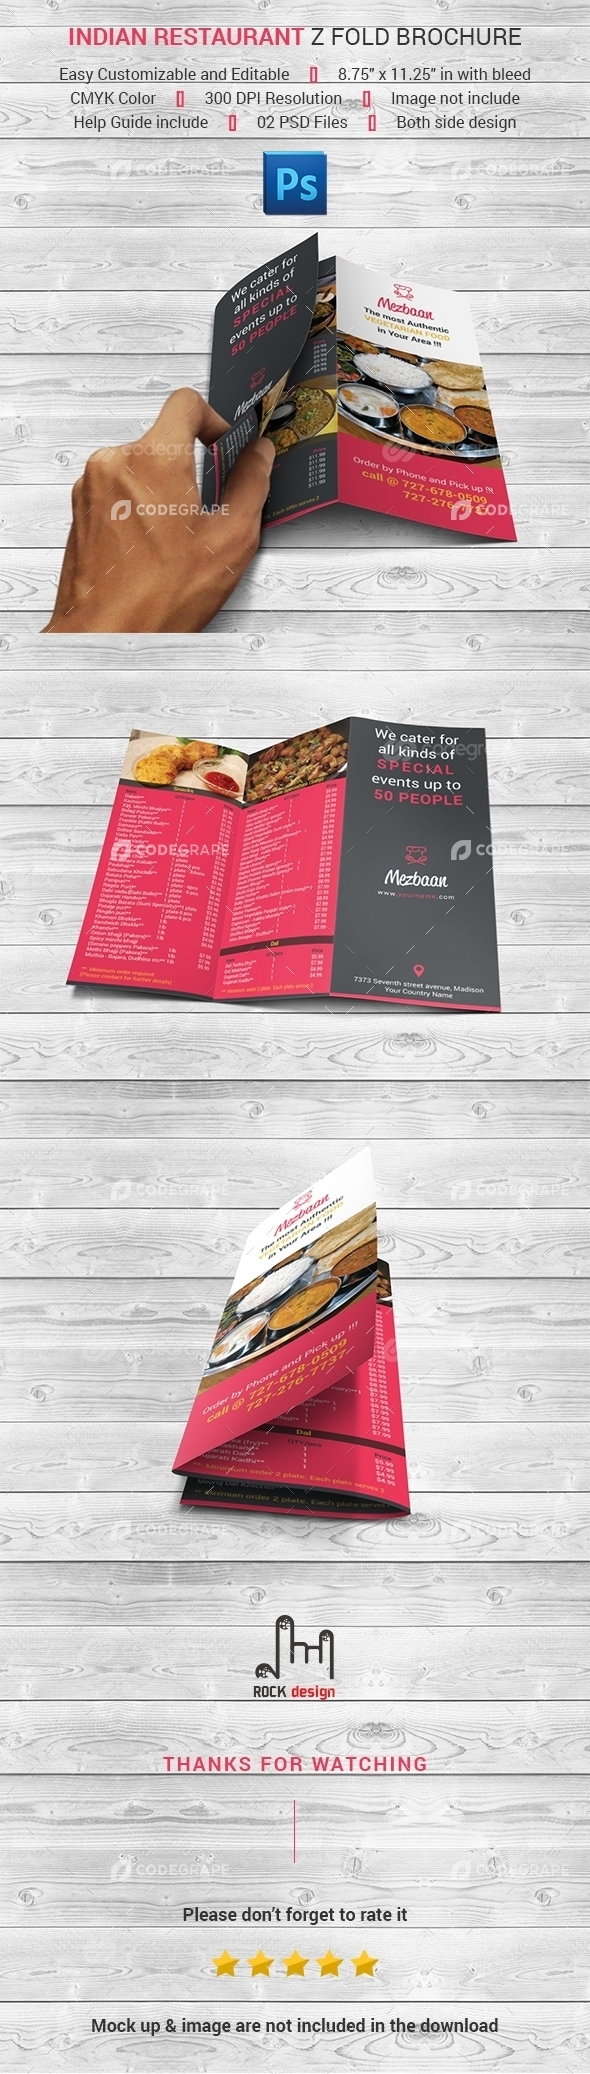 Indian Restaurant Z fold Brochure